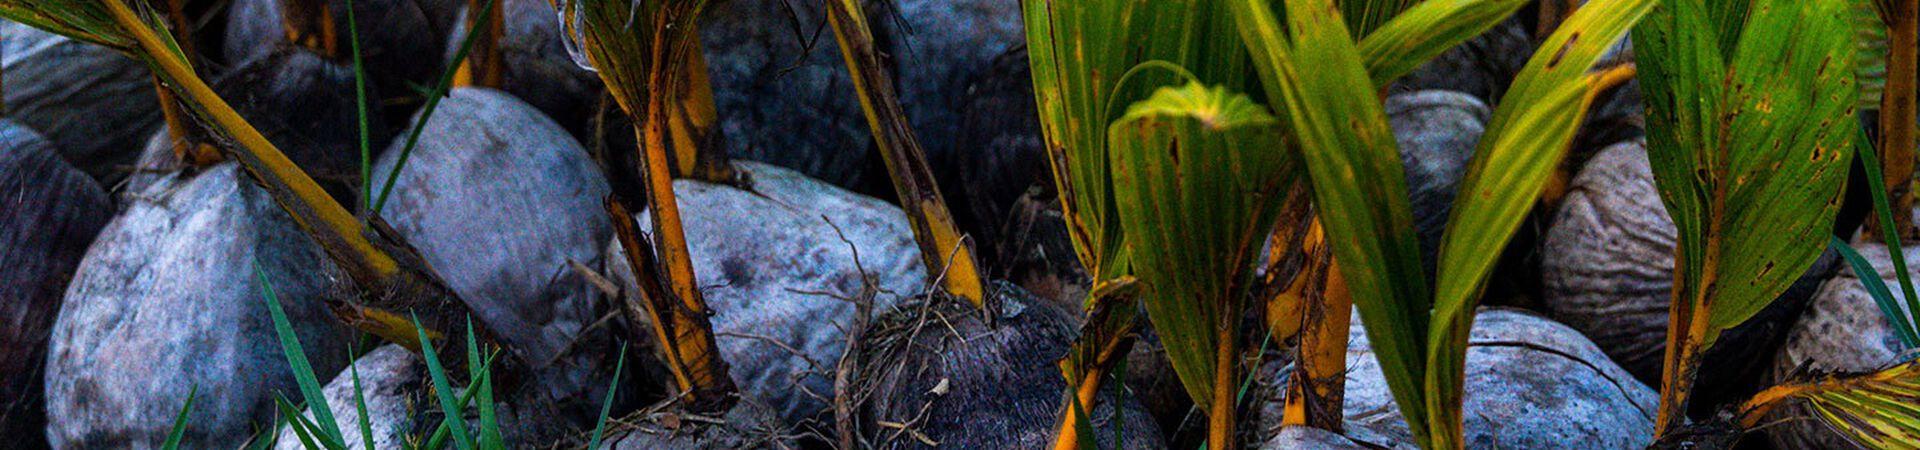 Banner - Revitalizing through Reforestation in Guatemala